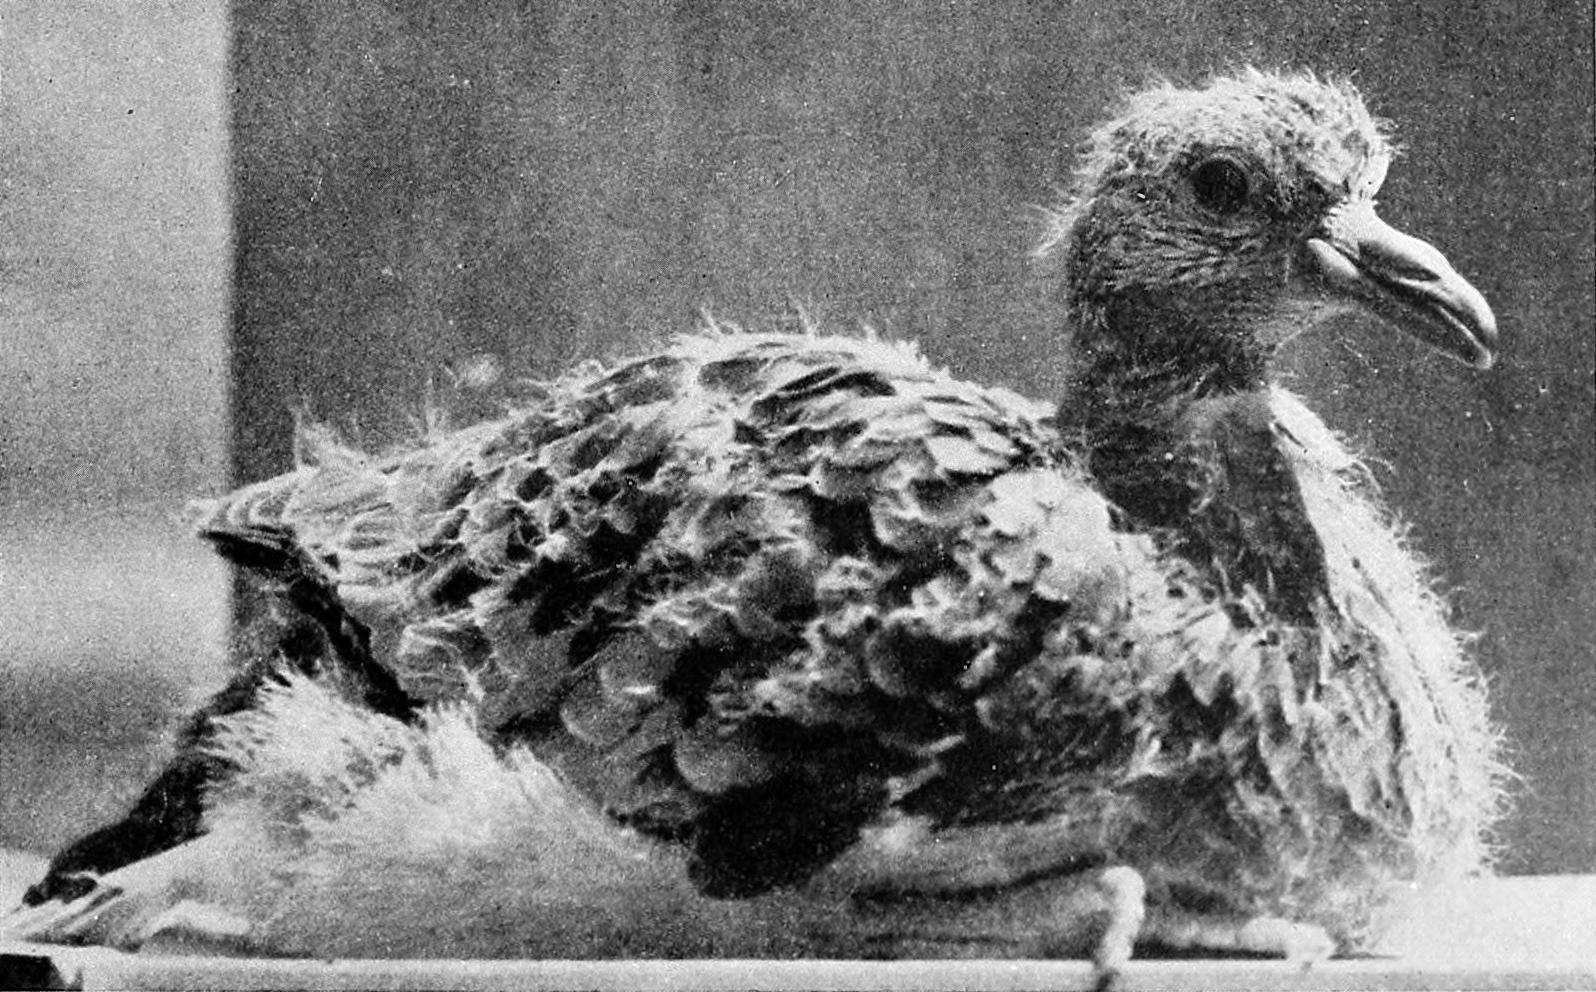 Live nestling or squab